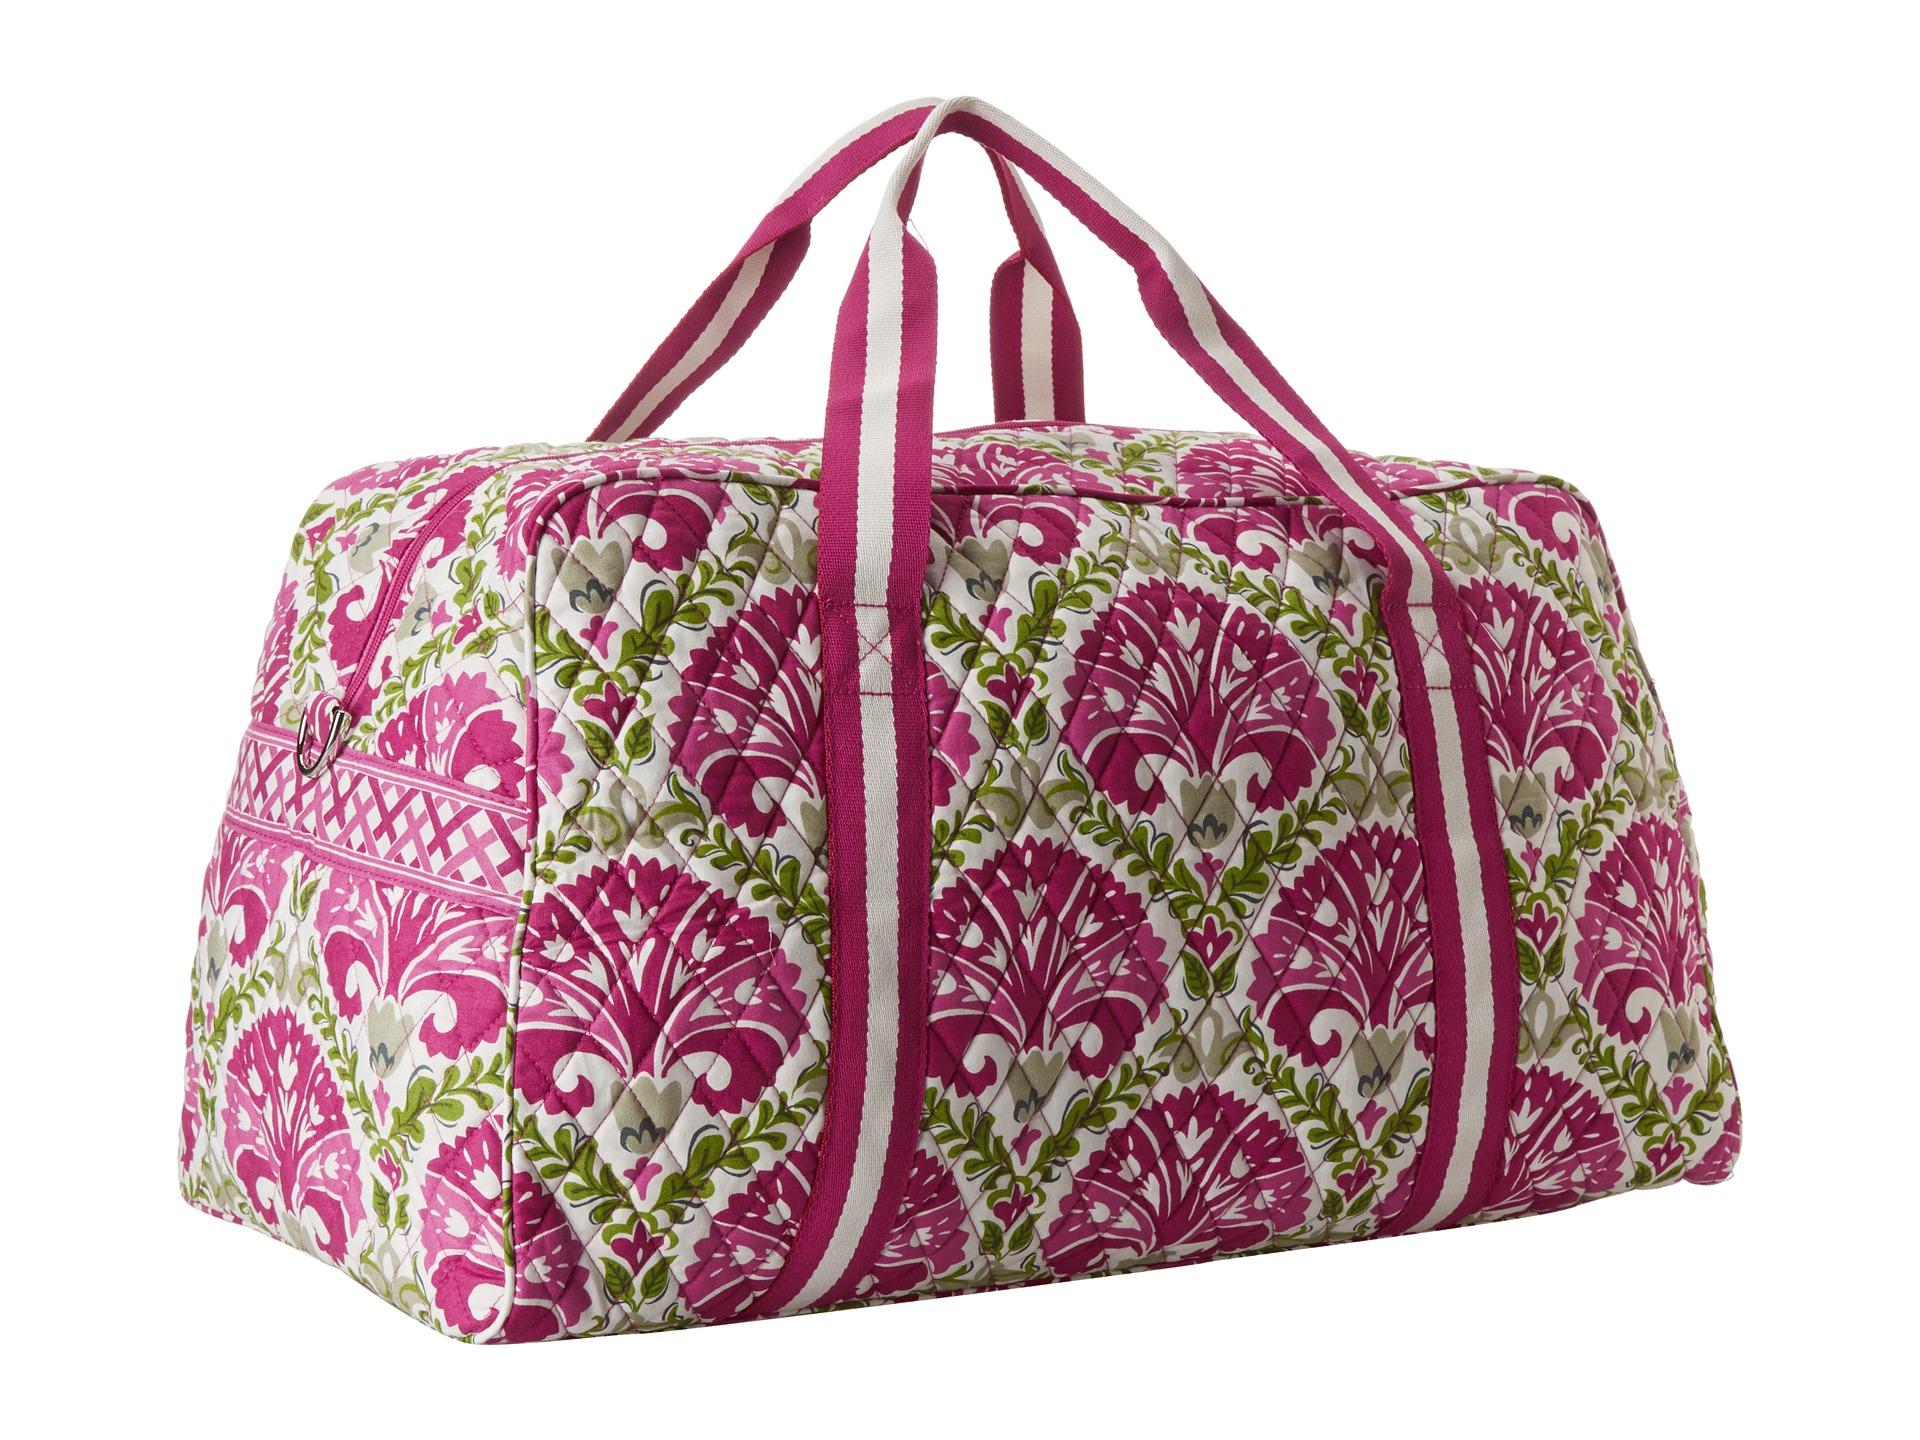 VERA BRADLEY BAG. Trending Deals Hot deal. 40% Off $ $ Vera Bradley LARGE DUFFEL TRAVEL BAG